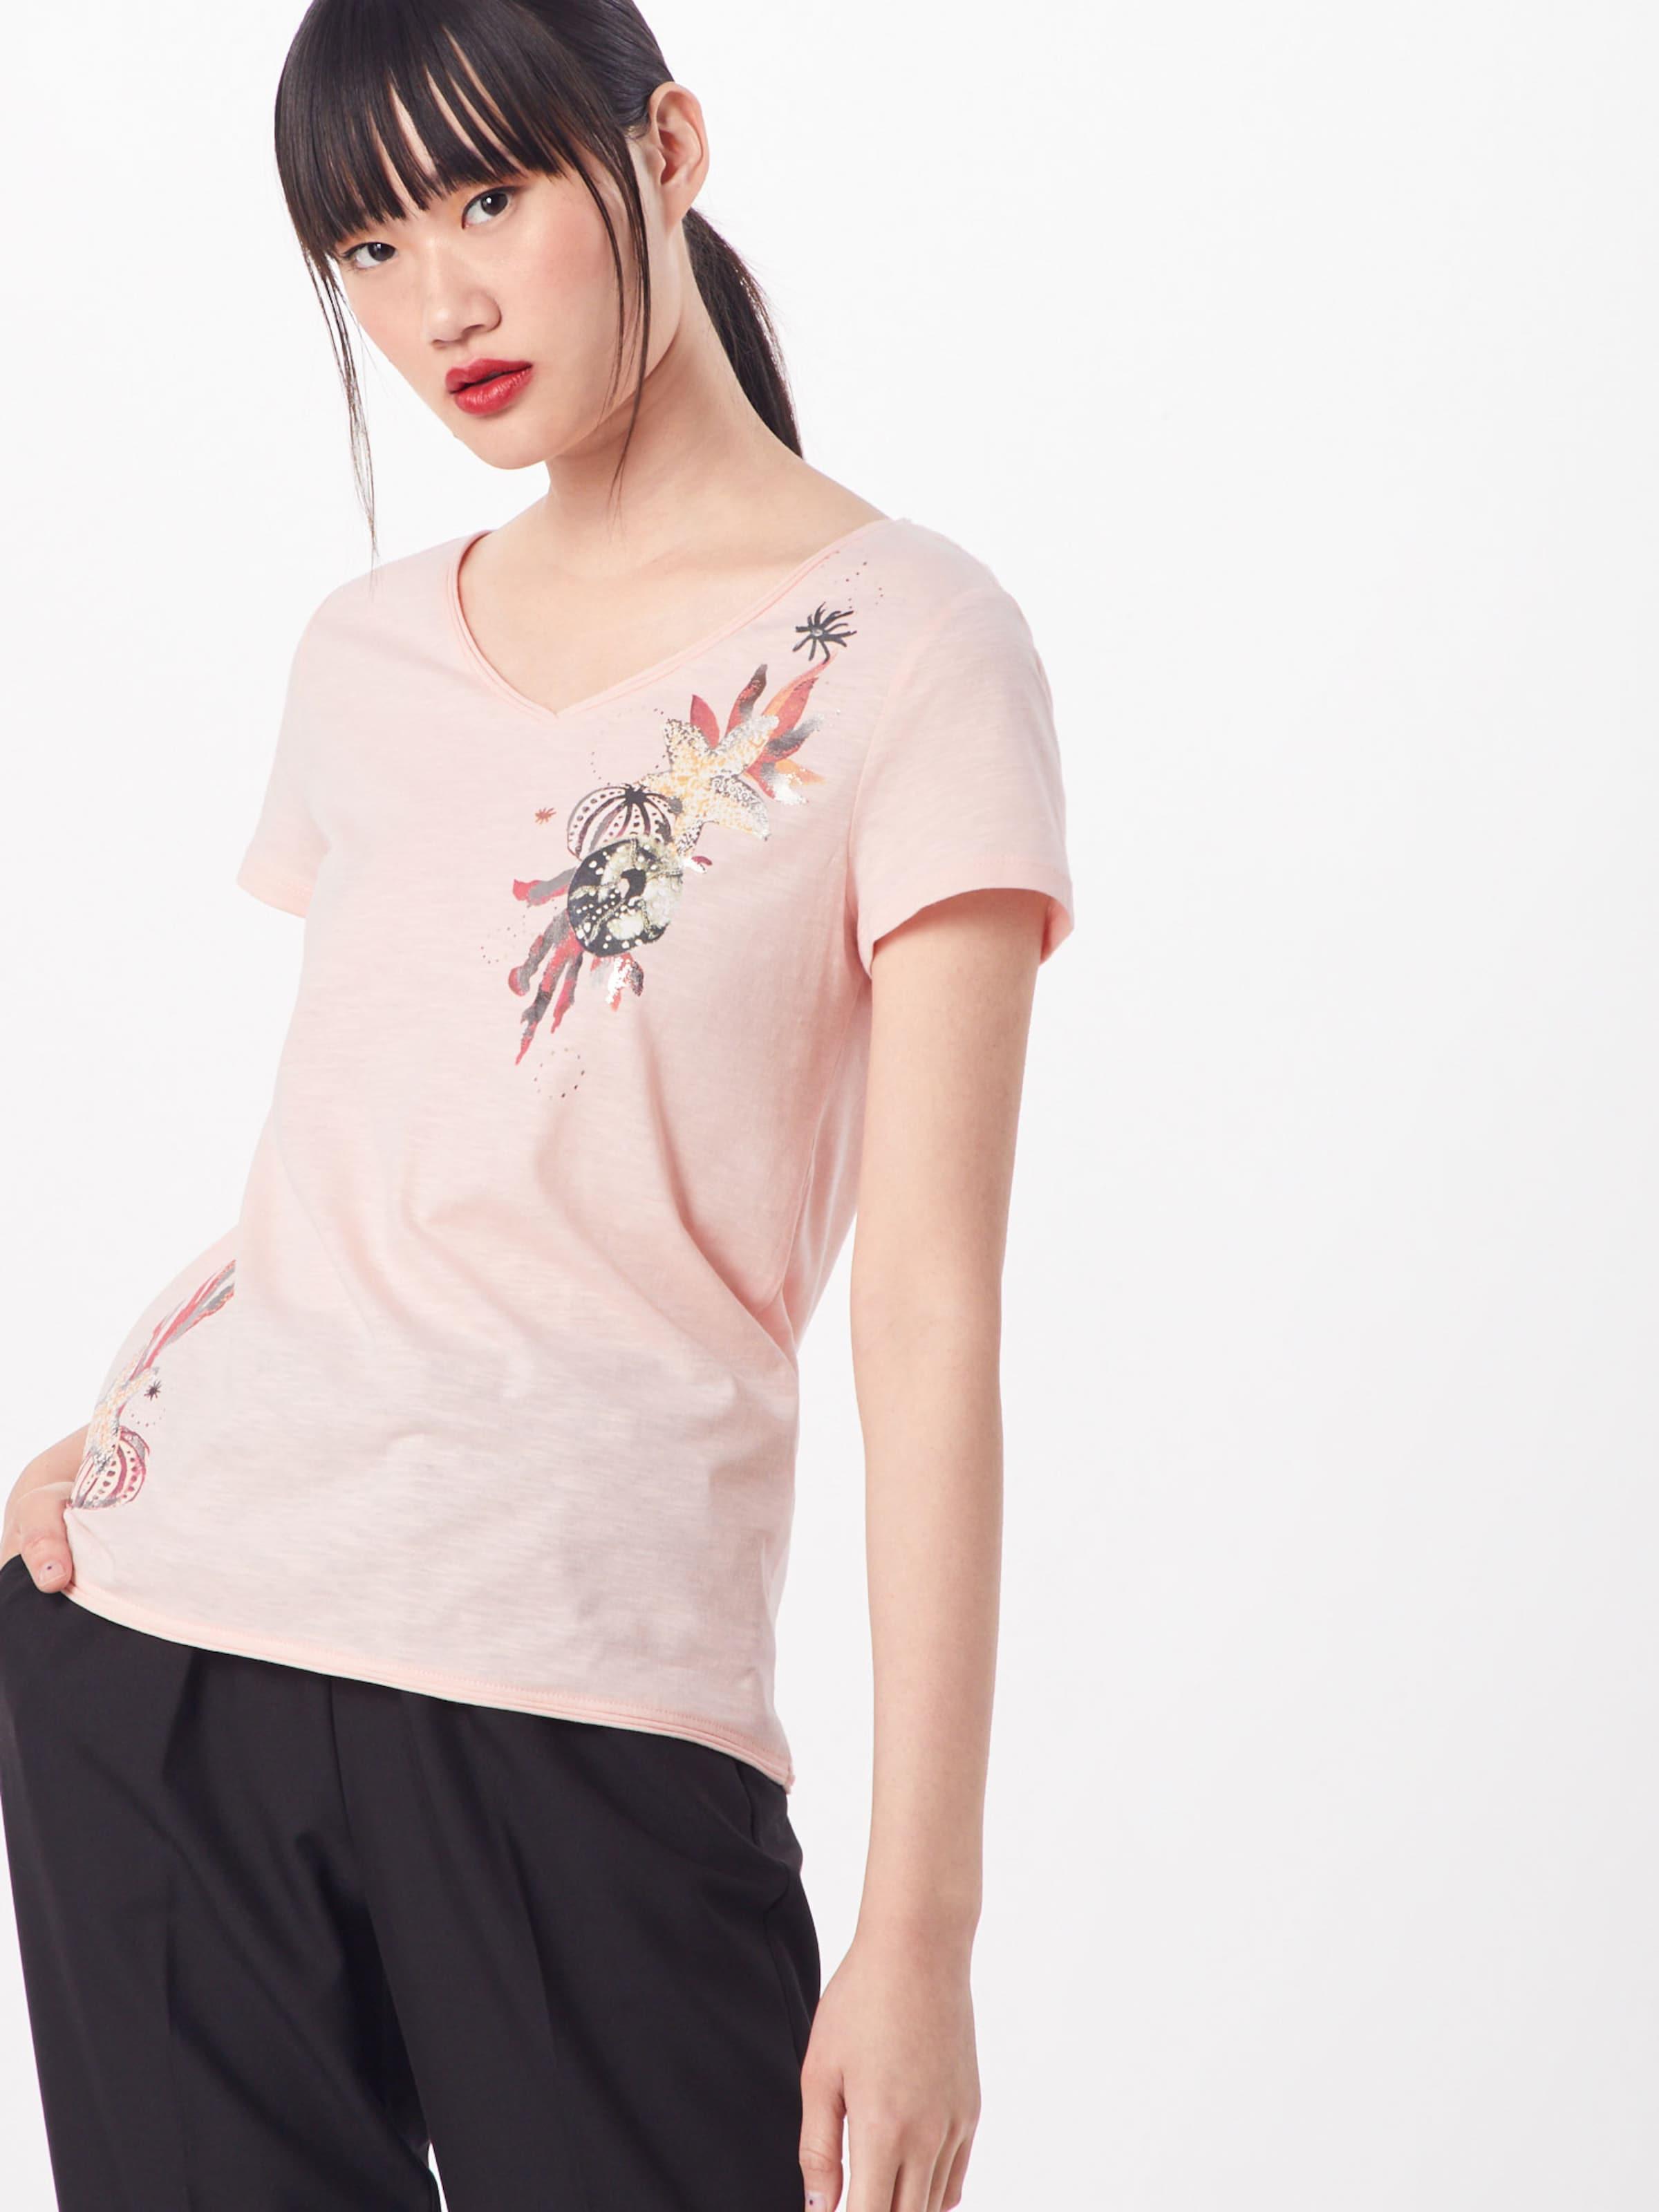 Rosa 'aw Tee' In Esprit Shirt Print qUVzpSM